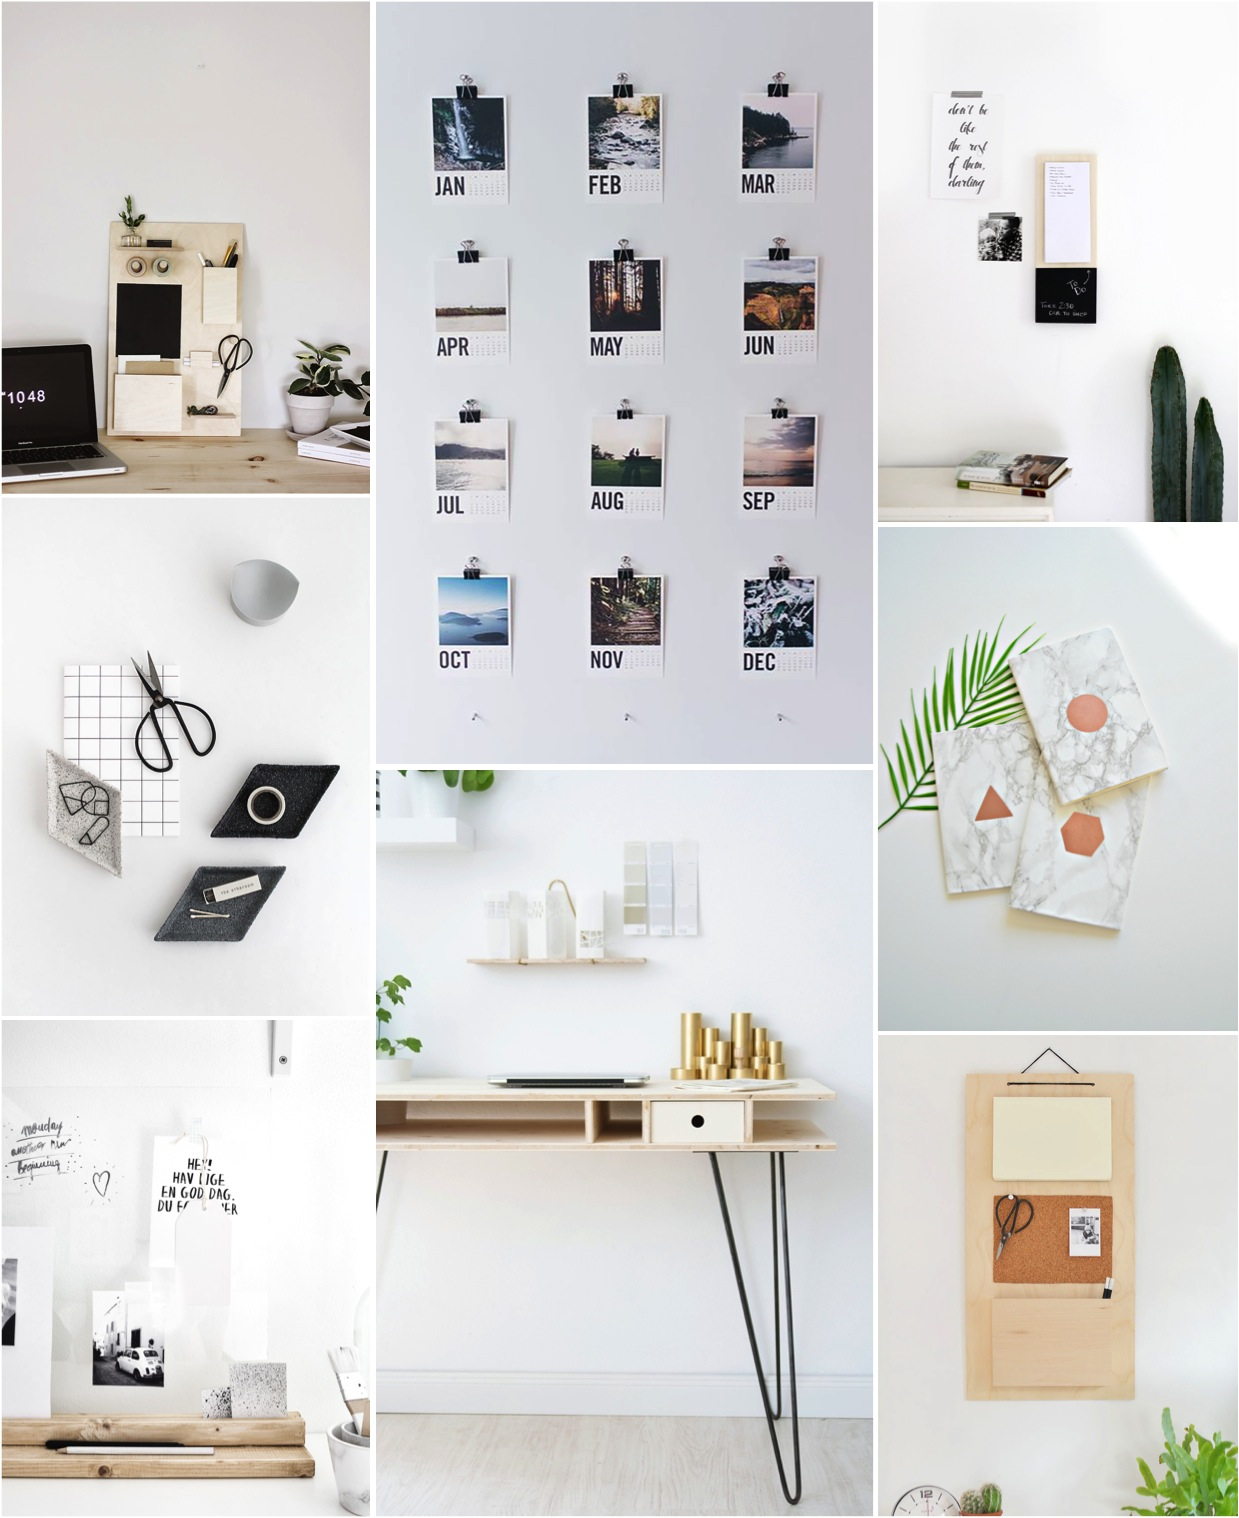 8 DIY desk organization ideas for a small home office - DIY ...